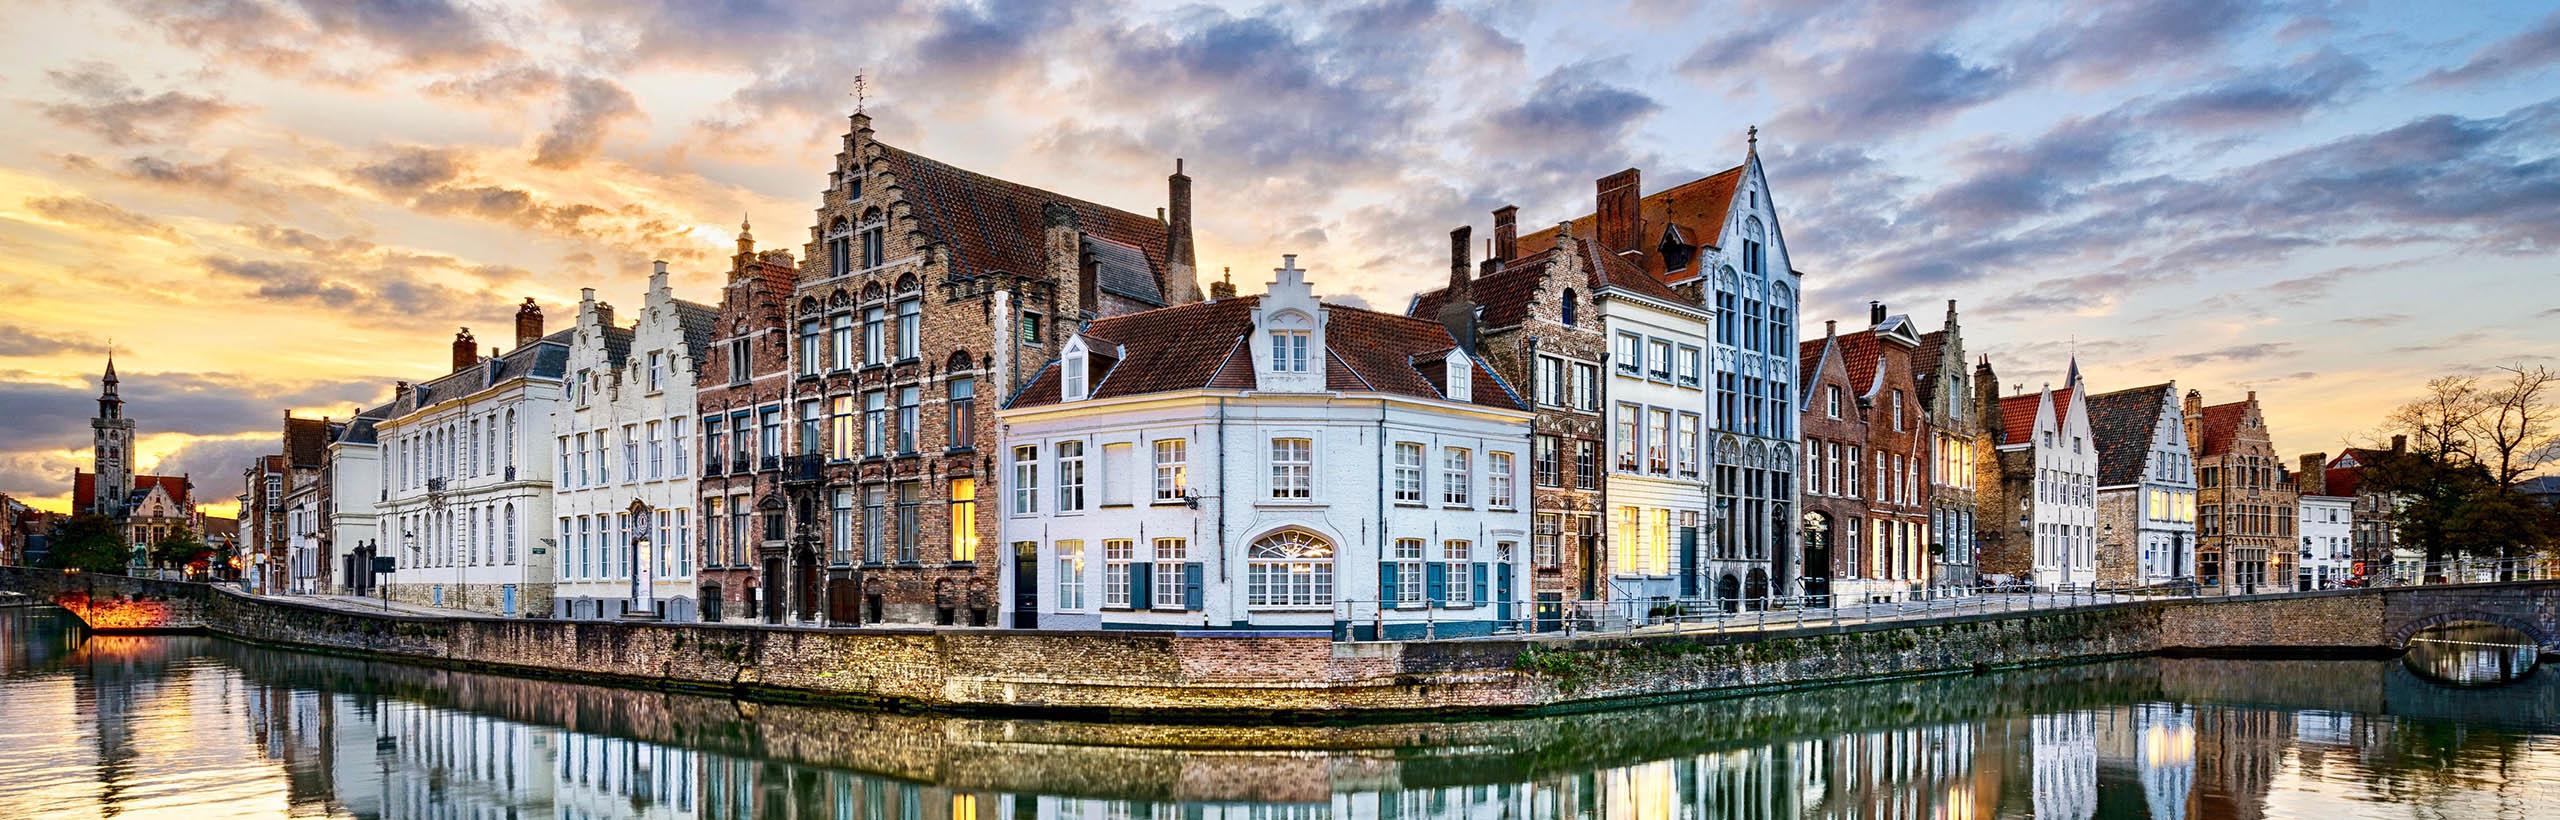 Brugge water avond